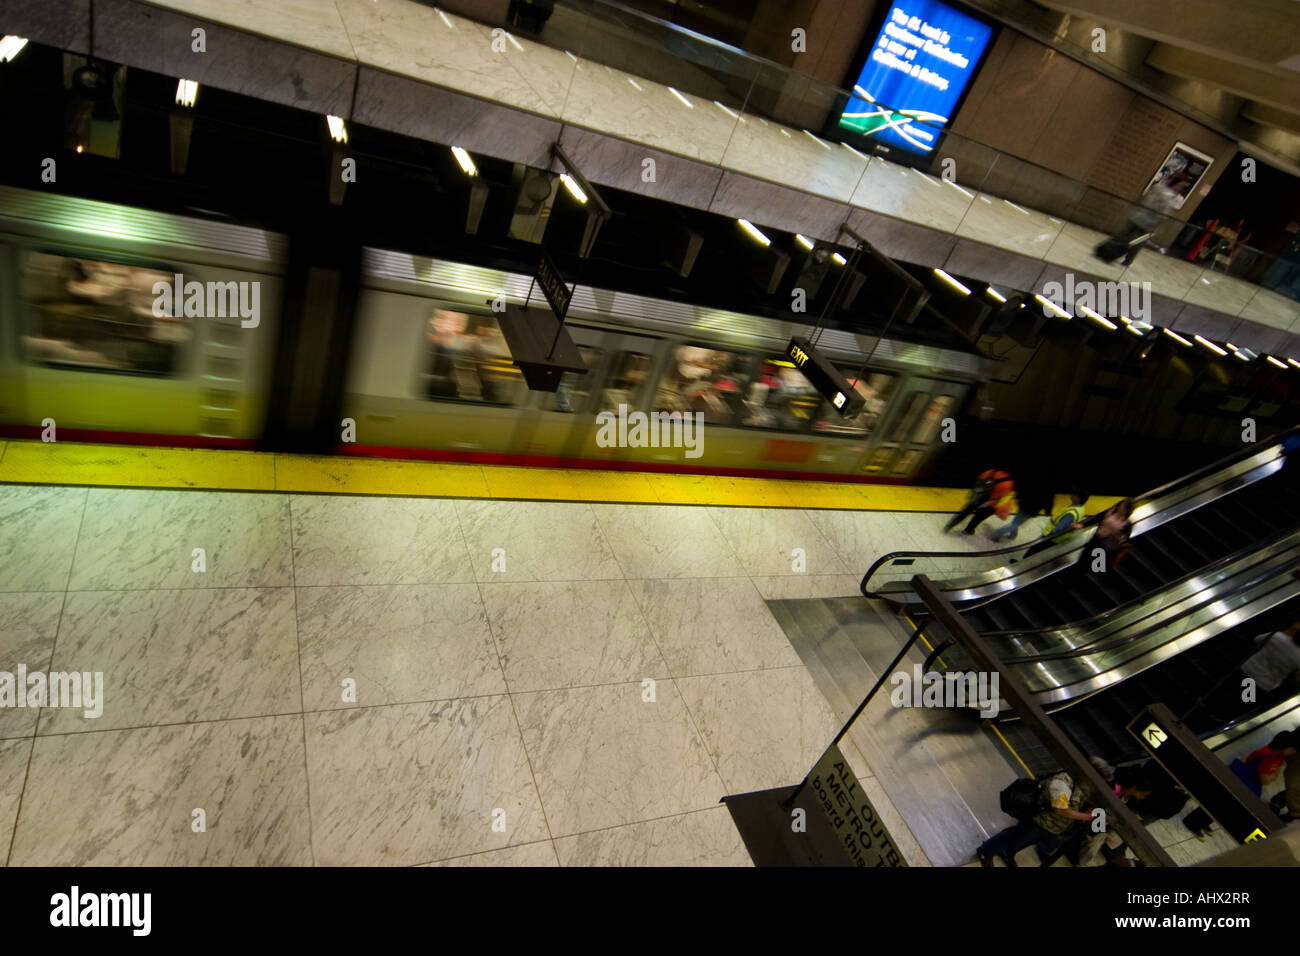 Subway train - Stock Image